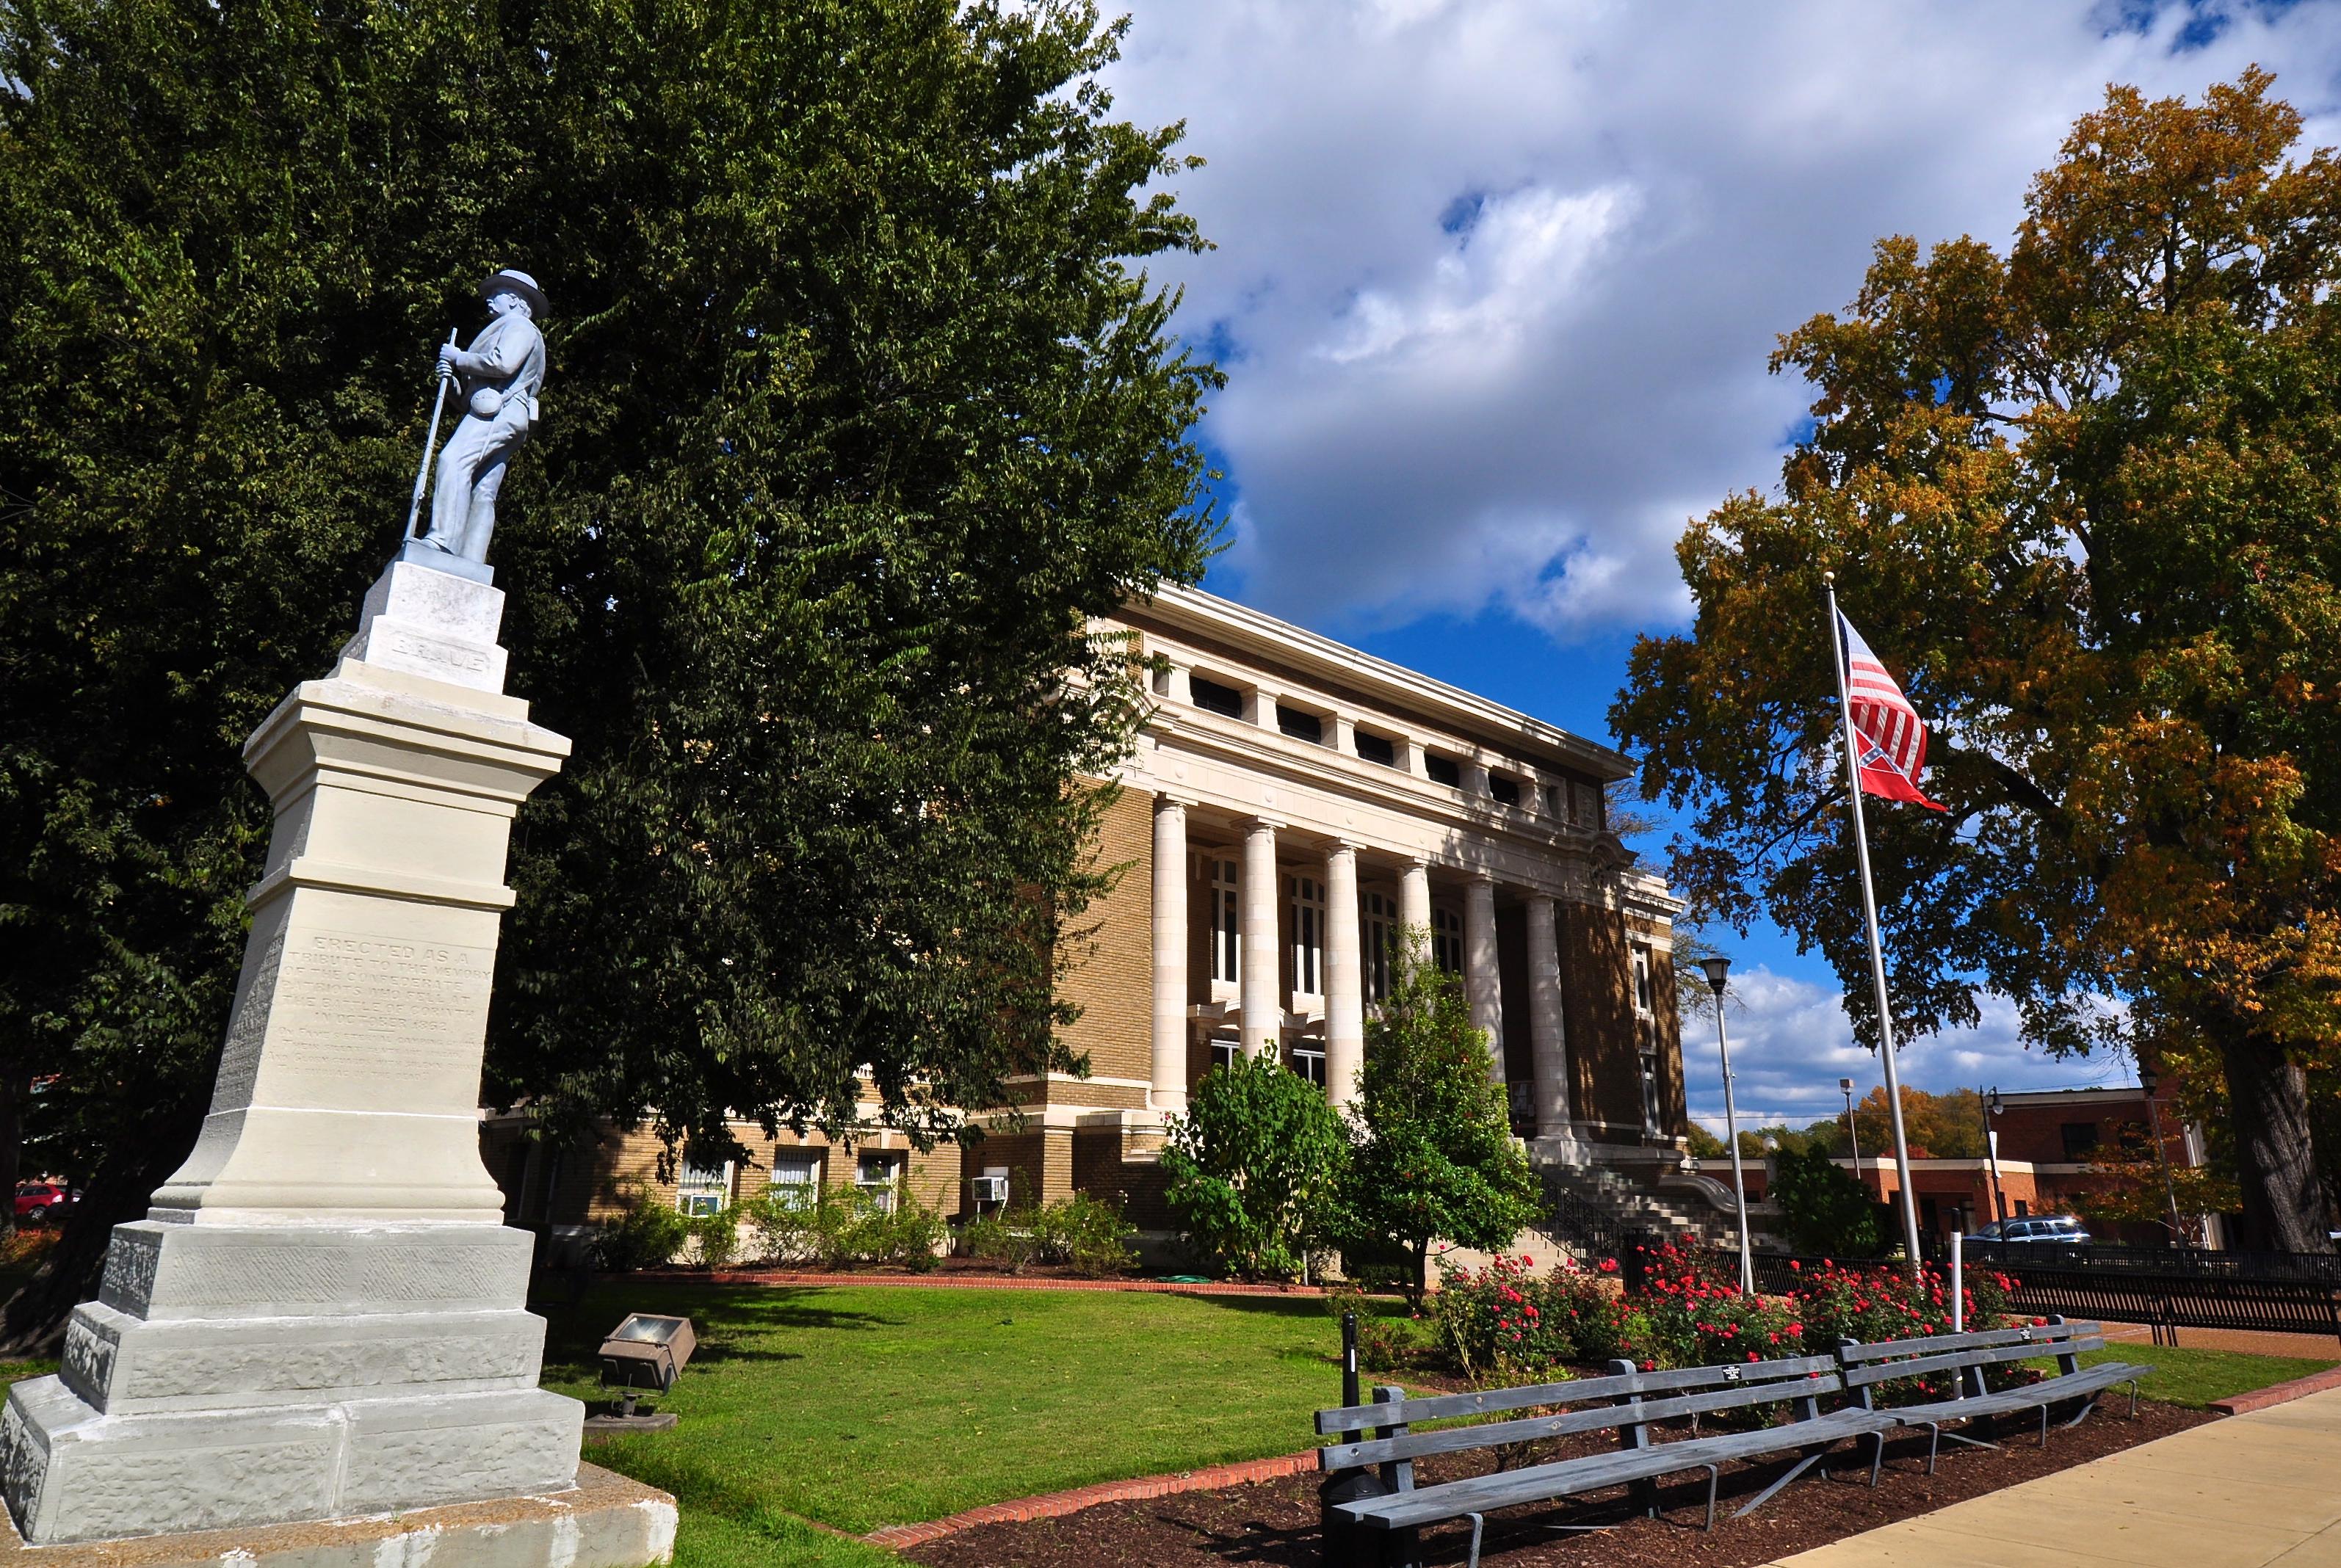 Mississippi Casino Revenues Plummet 10% in February